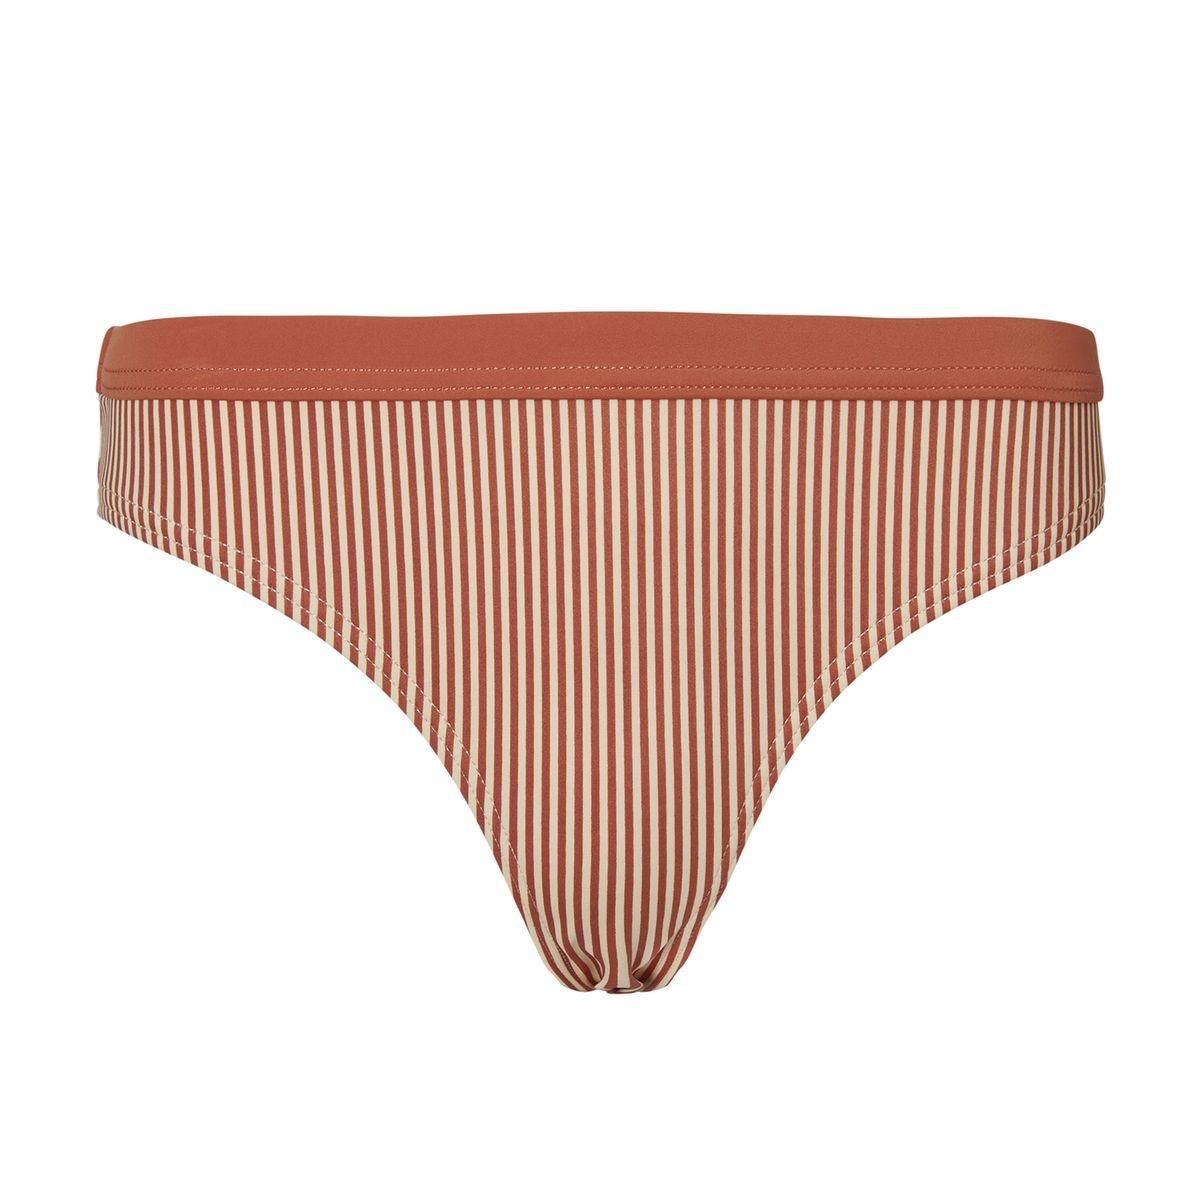 Bas de maillot de bain culotte bikini Barbara